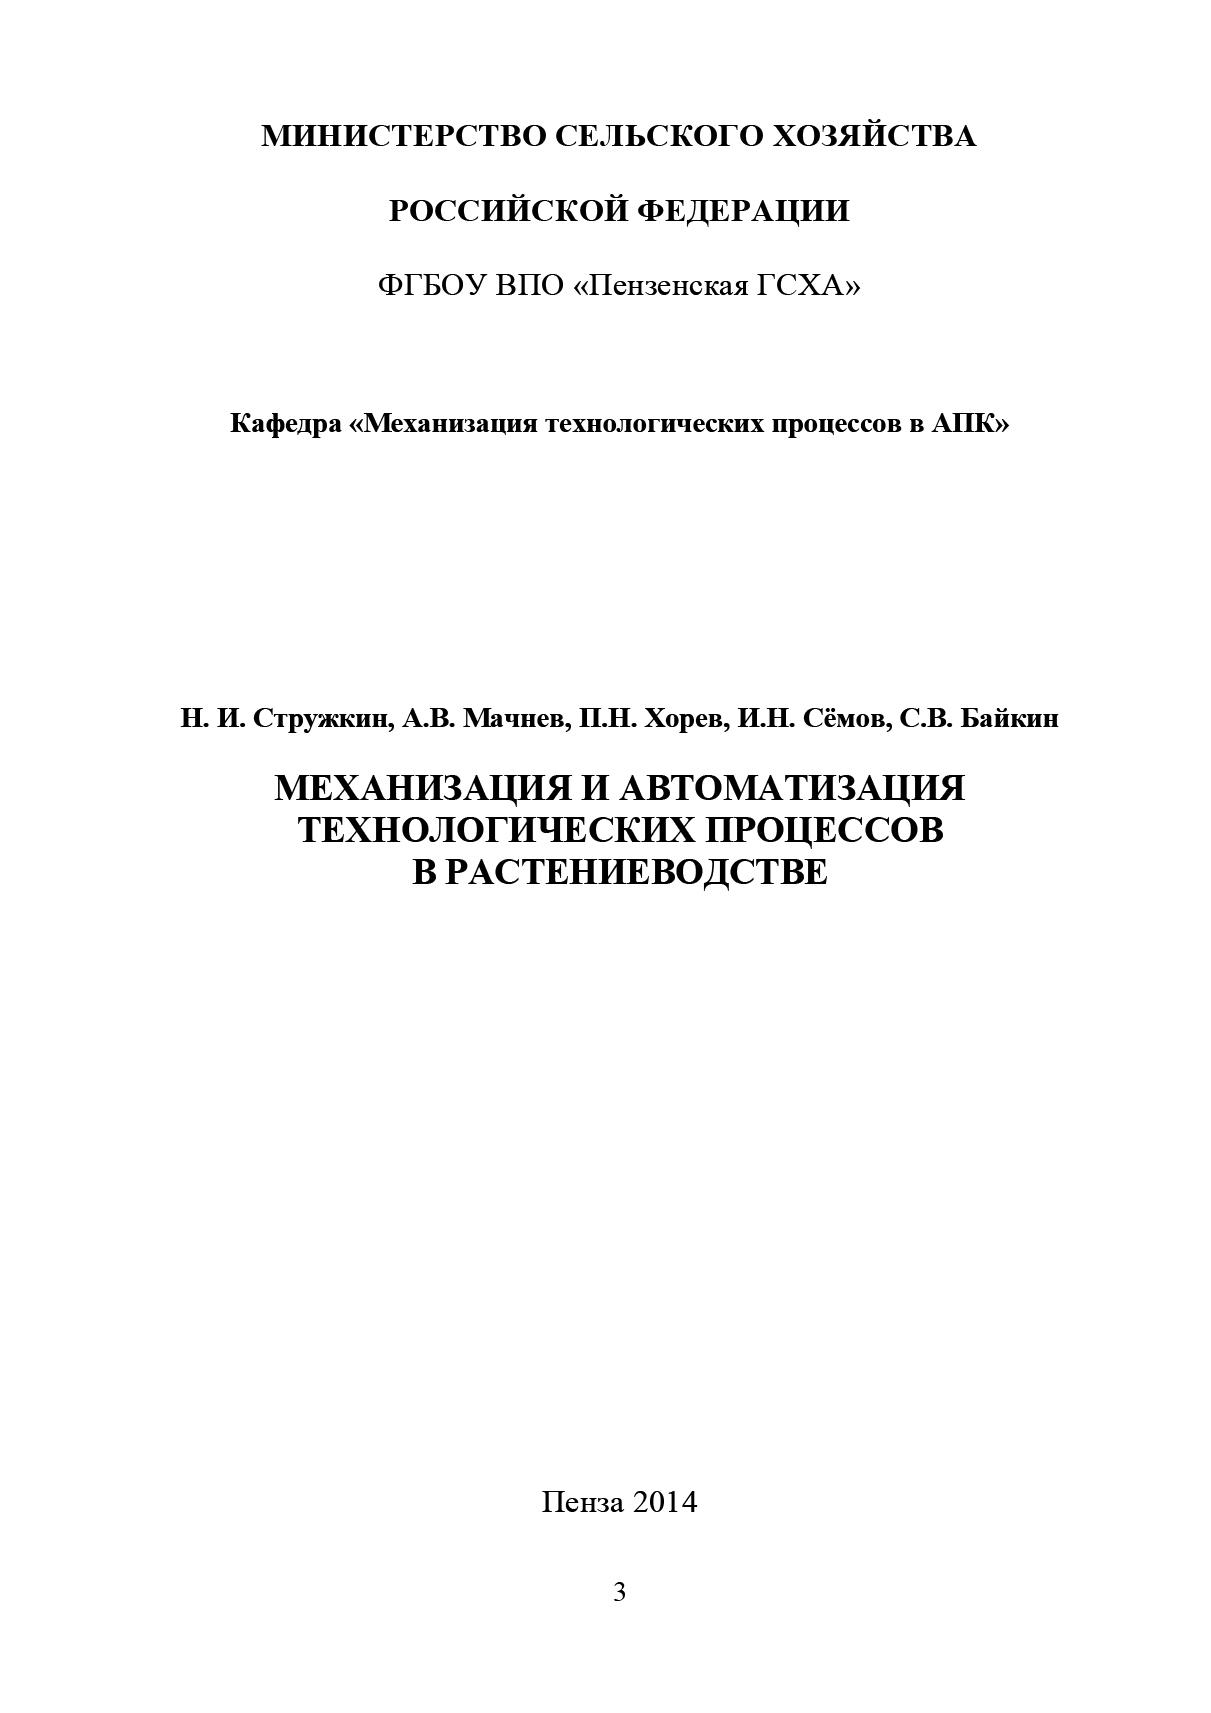 Семён Байкин Механизация и автоматизация технологических процессов в растениеводстве автомагнитола mp3 sd mmc usb usb aux